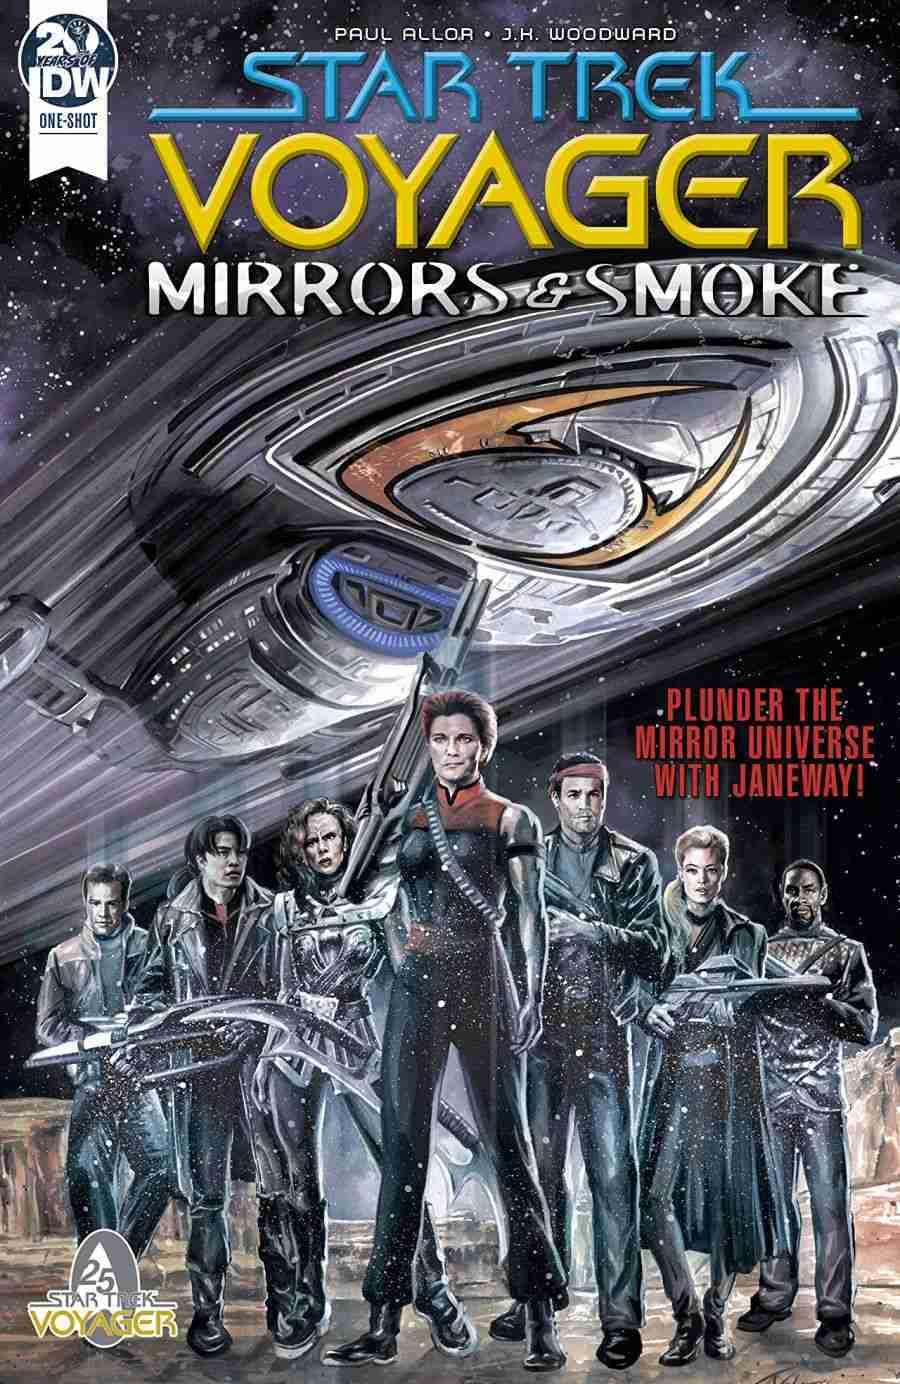 Star Trek Voyager Mirrors and Smoke